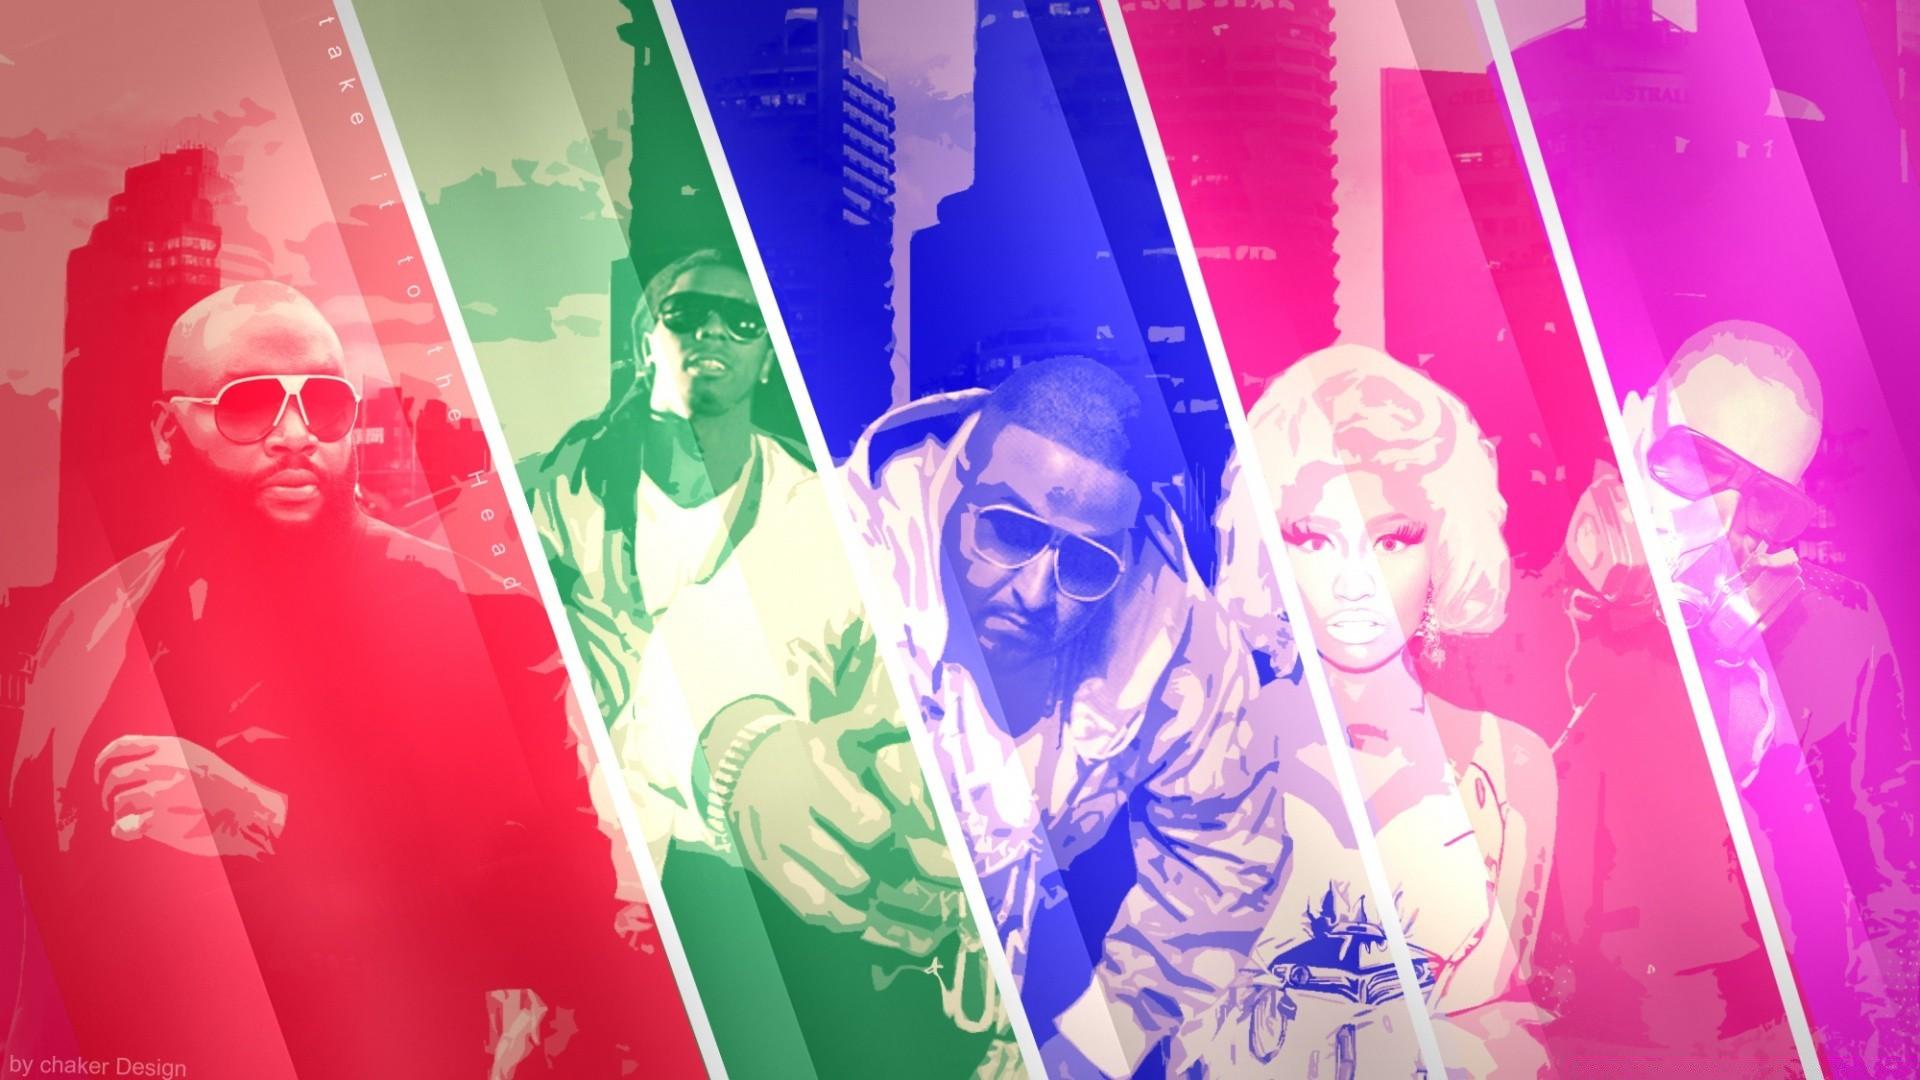 Chris Brown Nicki Minaj Rick Ross Dj Khaled Lil Wayne